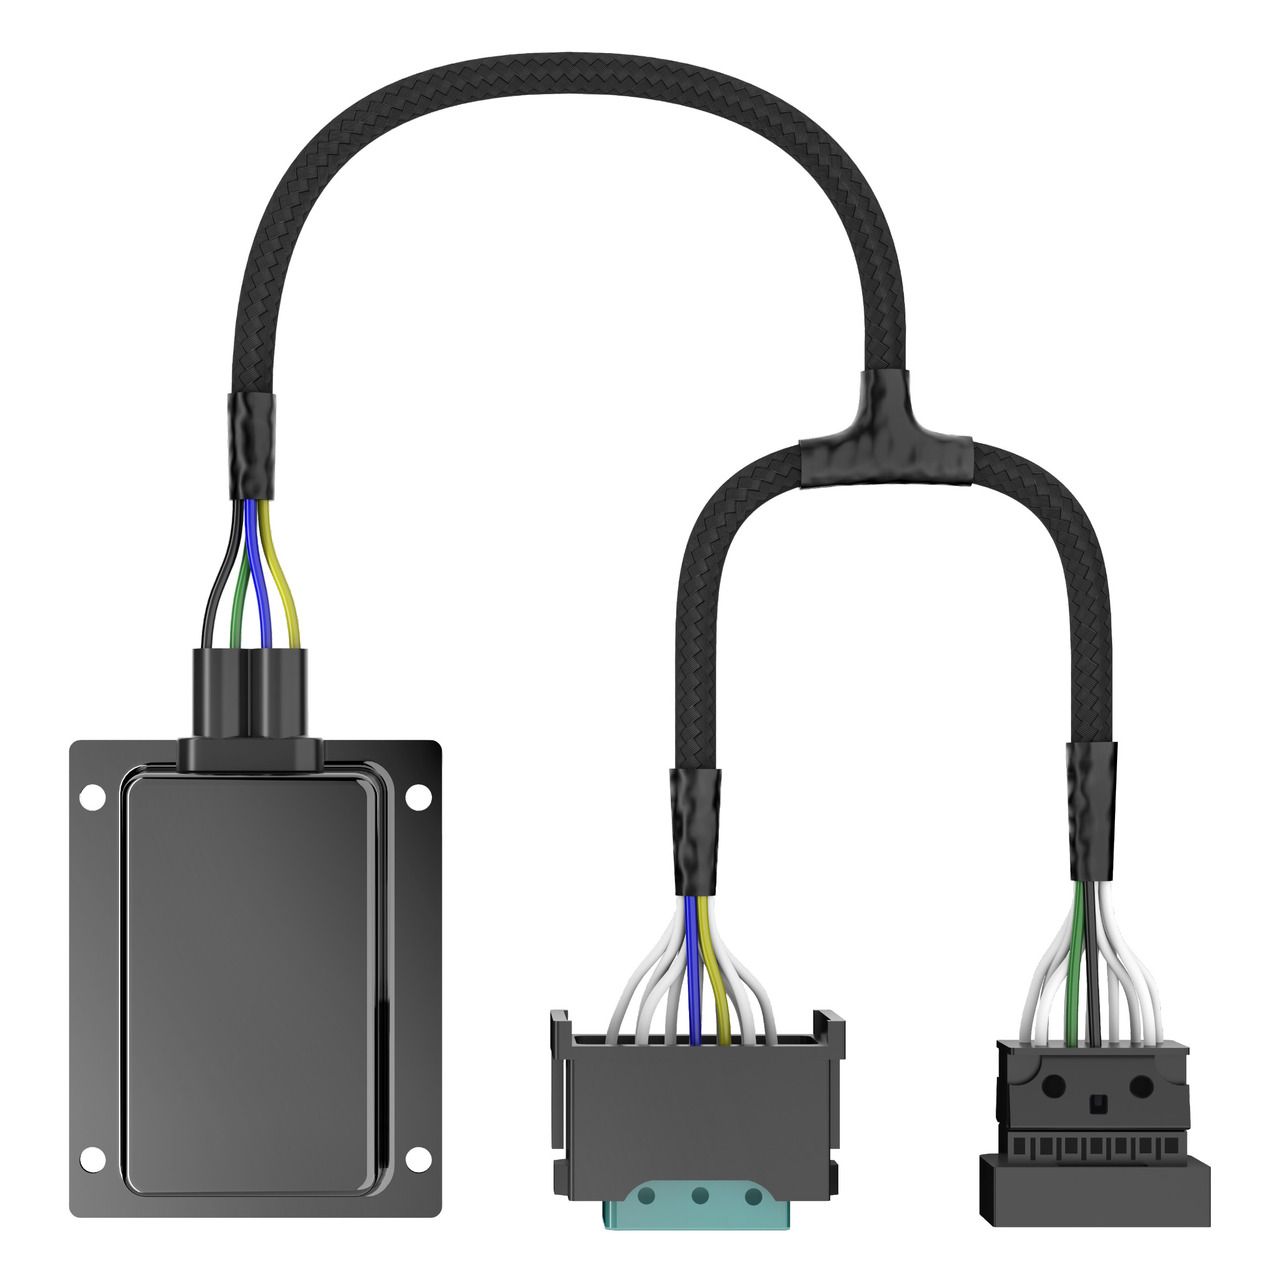 OSRAM LEDriving Smart CAN-Bus LEDSC03 für NIGHT BREAKER® LED- für kompatible BMW-Kfz